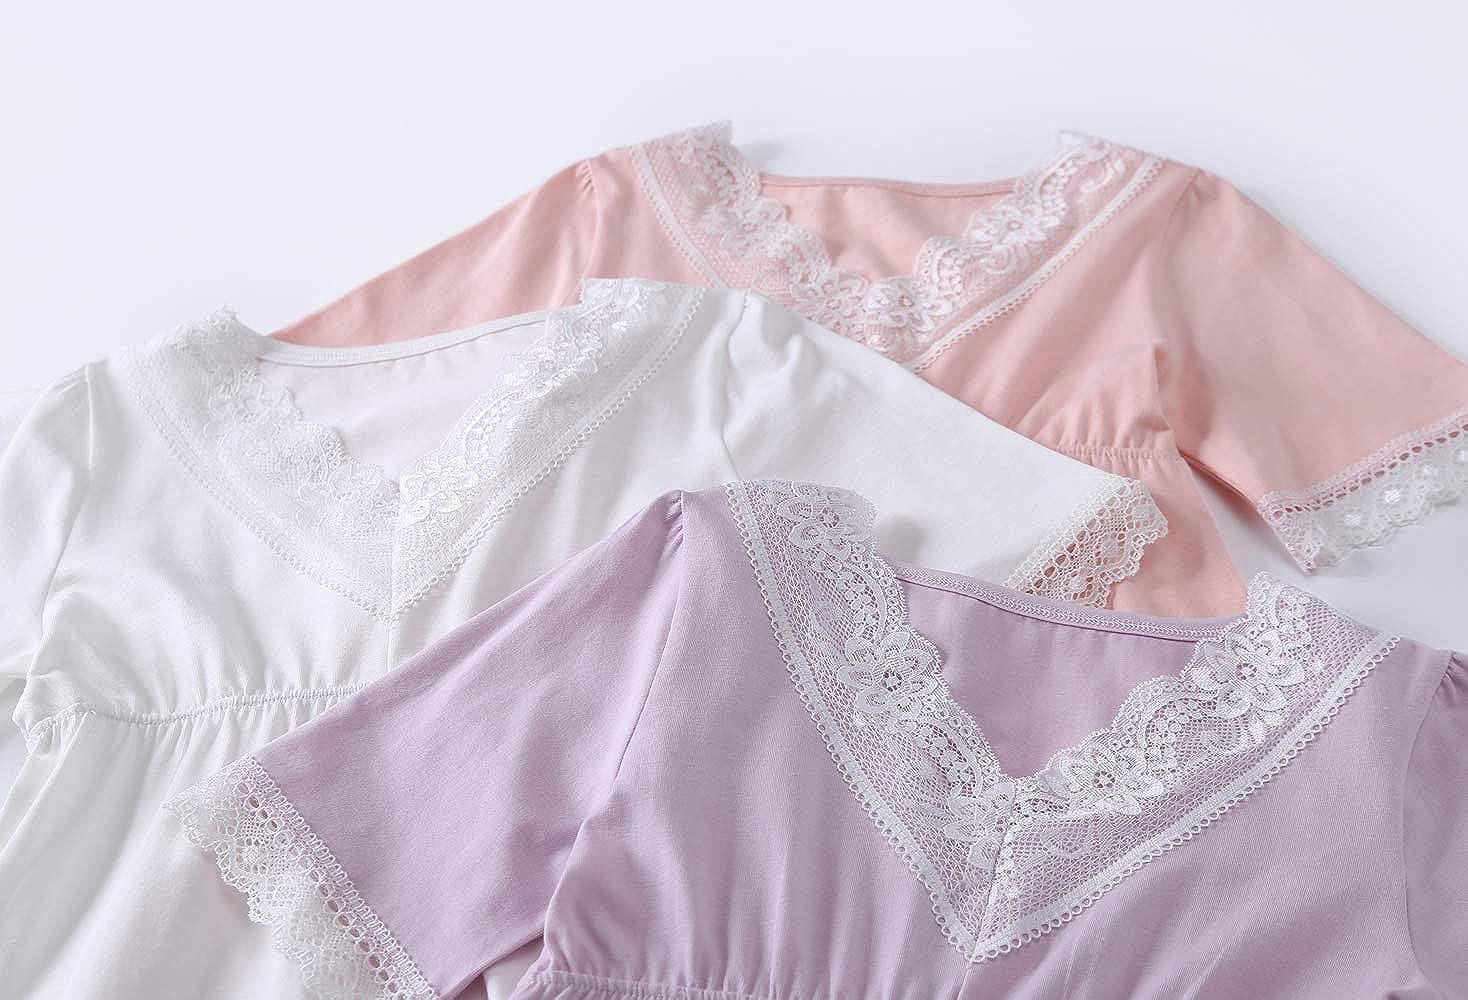 Allmeingeld Girls Princess Nighties Lace Nightgowns 100/% Cotton Sleepwear for 3-10 Years